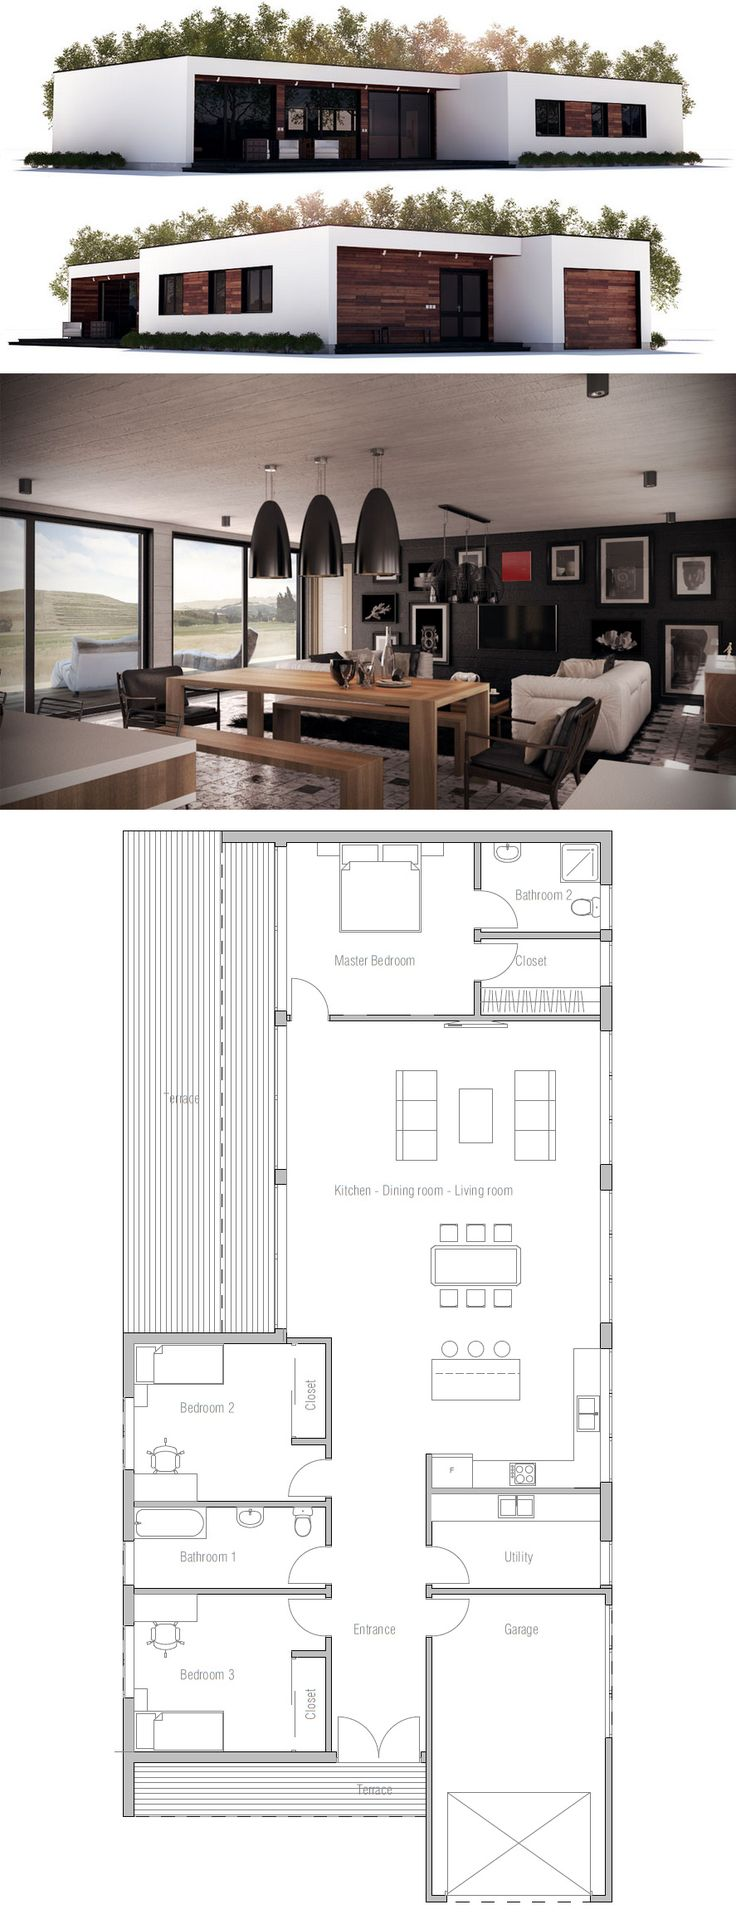 Brilliant Top 25 Ideas About H House Plans On Pinterest Craftsman Plan Largest Home Design Picture Inspirations Pitcheantrous